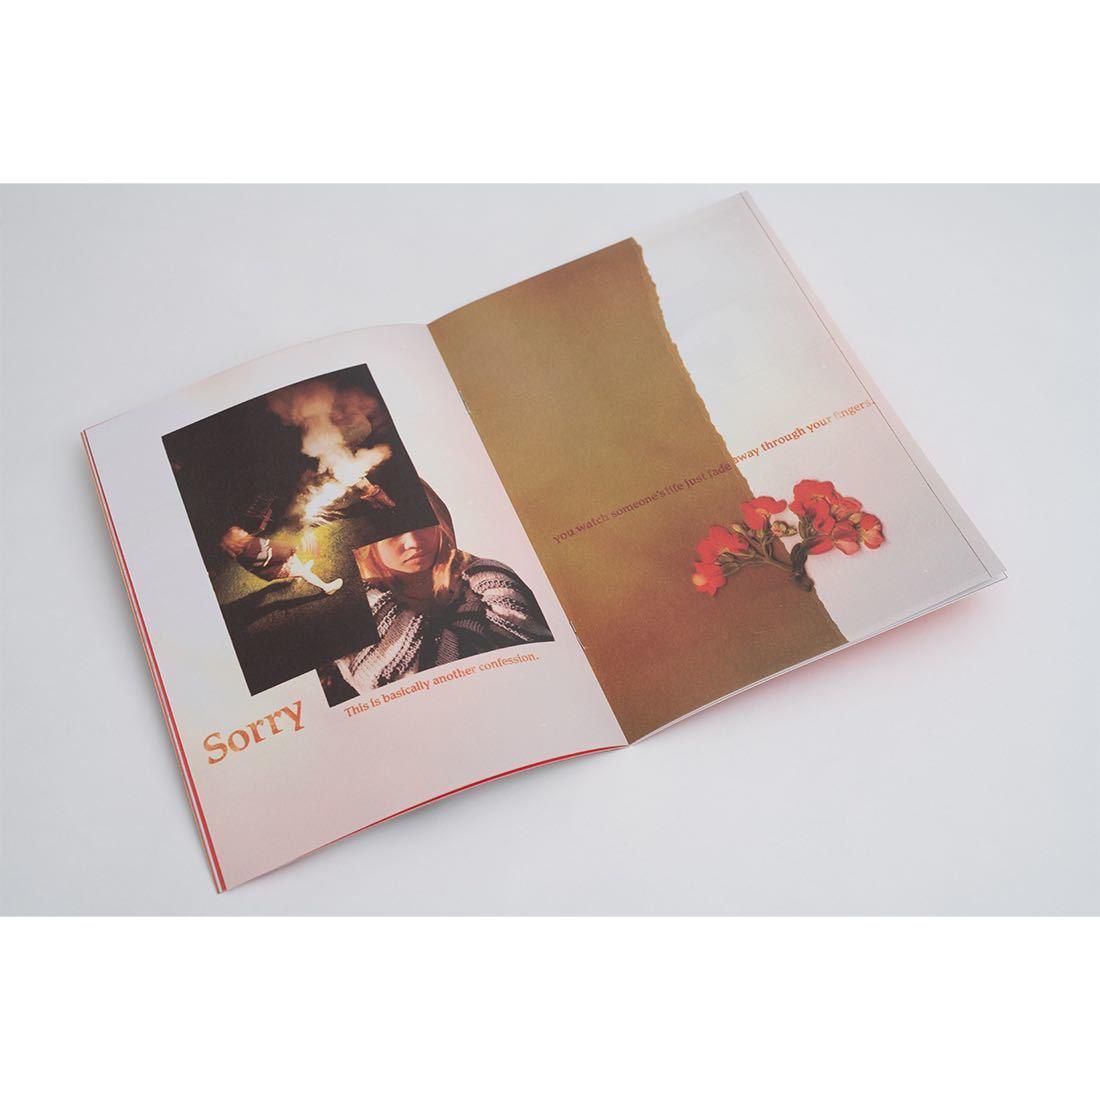 UK限定Zine盤+CD Beabadoobee『Fake It Flowers』◯UK輸入盤 ◯ ビーバドゥービー ◯CD アルバム The 1975 Rina Sawayama